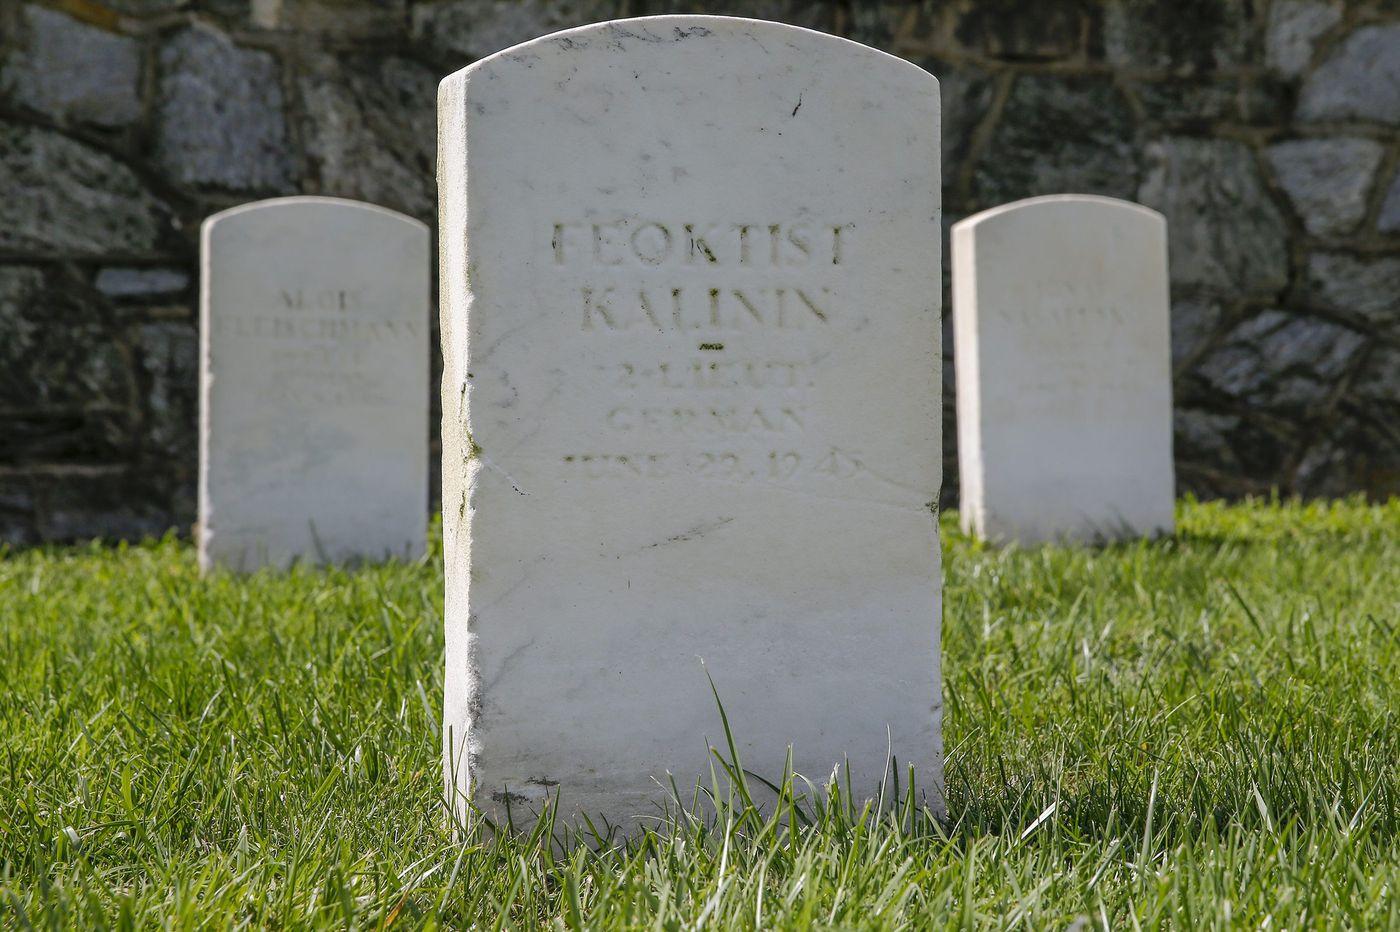 POWs, prison riot, suicide plan: A forgotten New Jersey war story